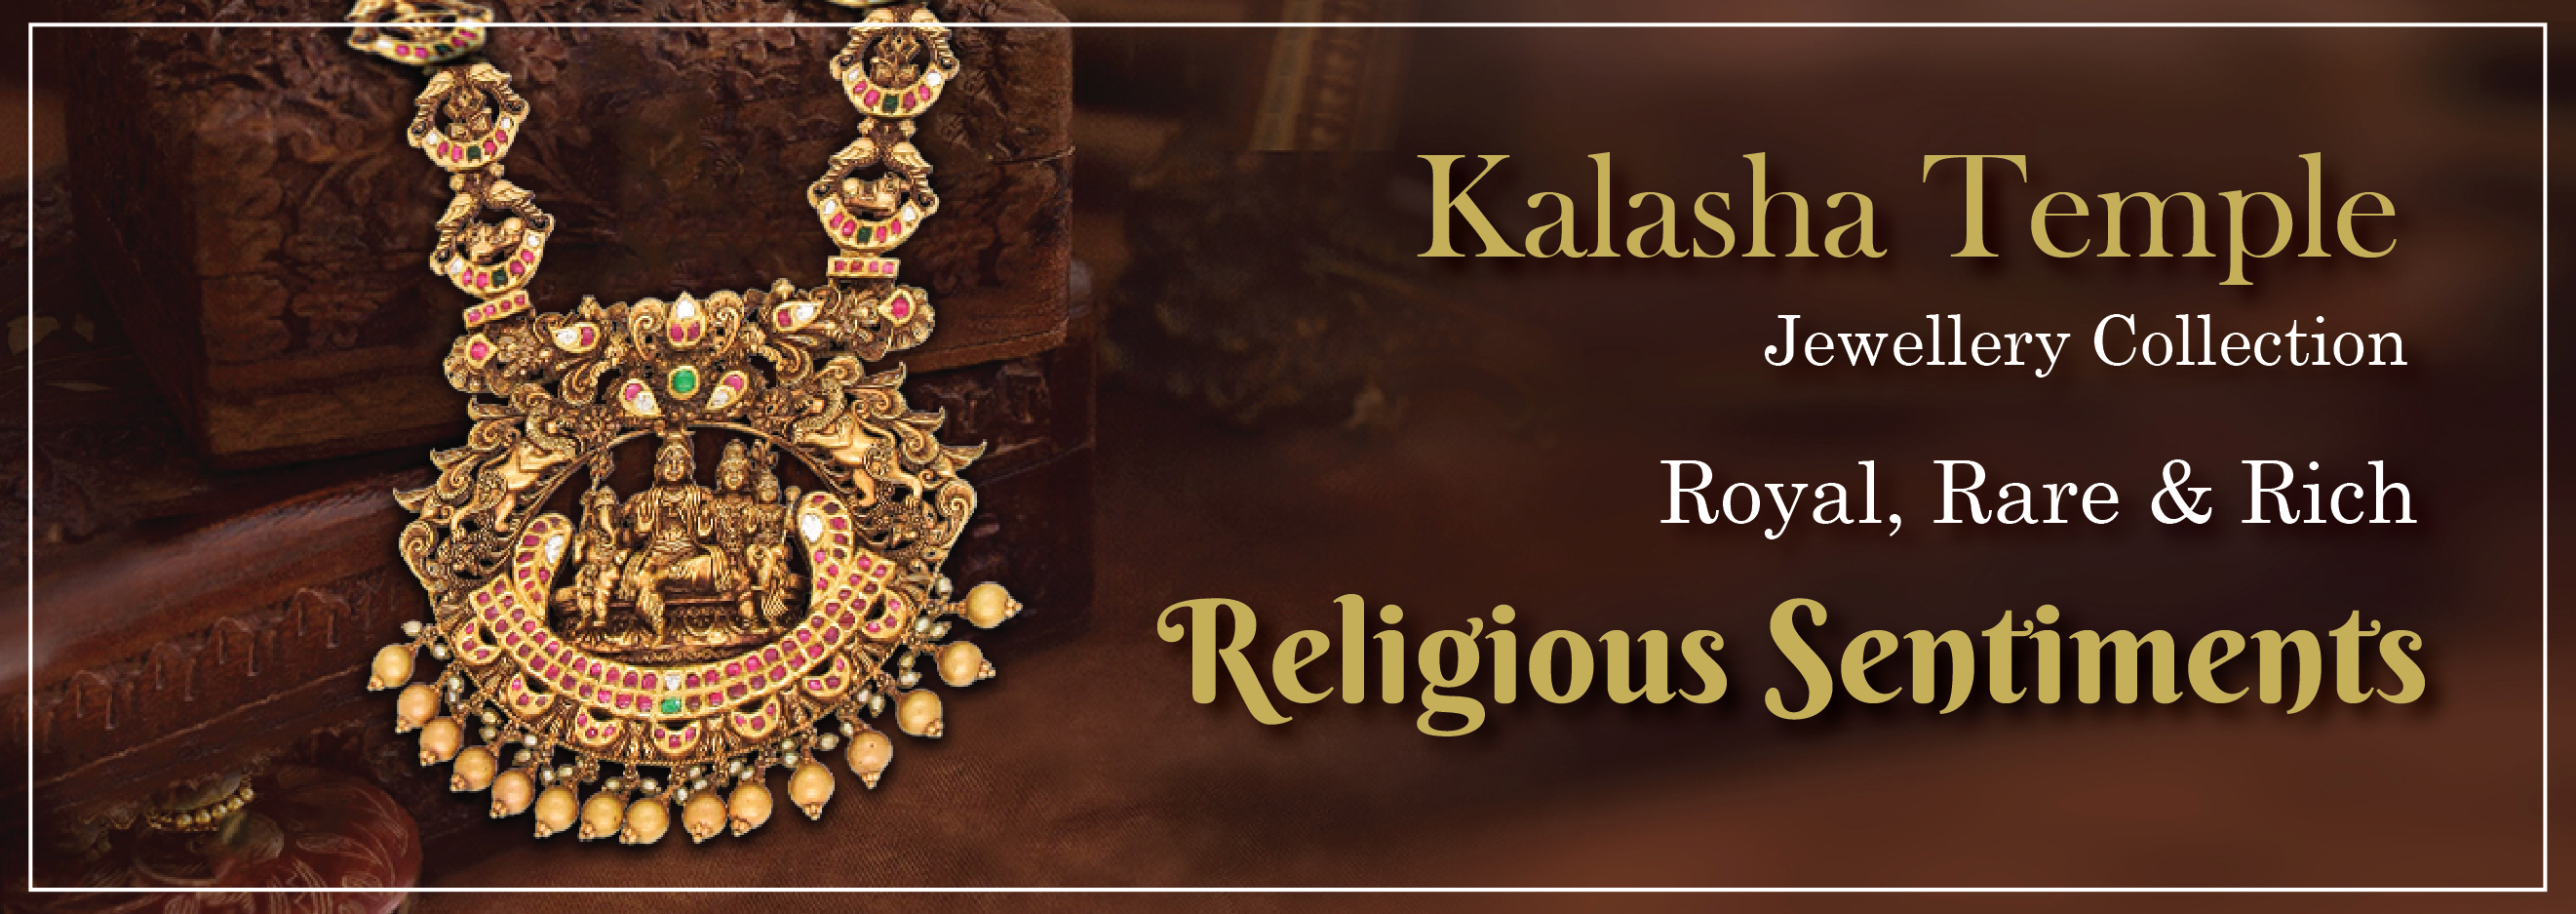 Kalasha-Temple-Collection-cover-b-01